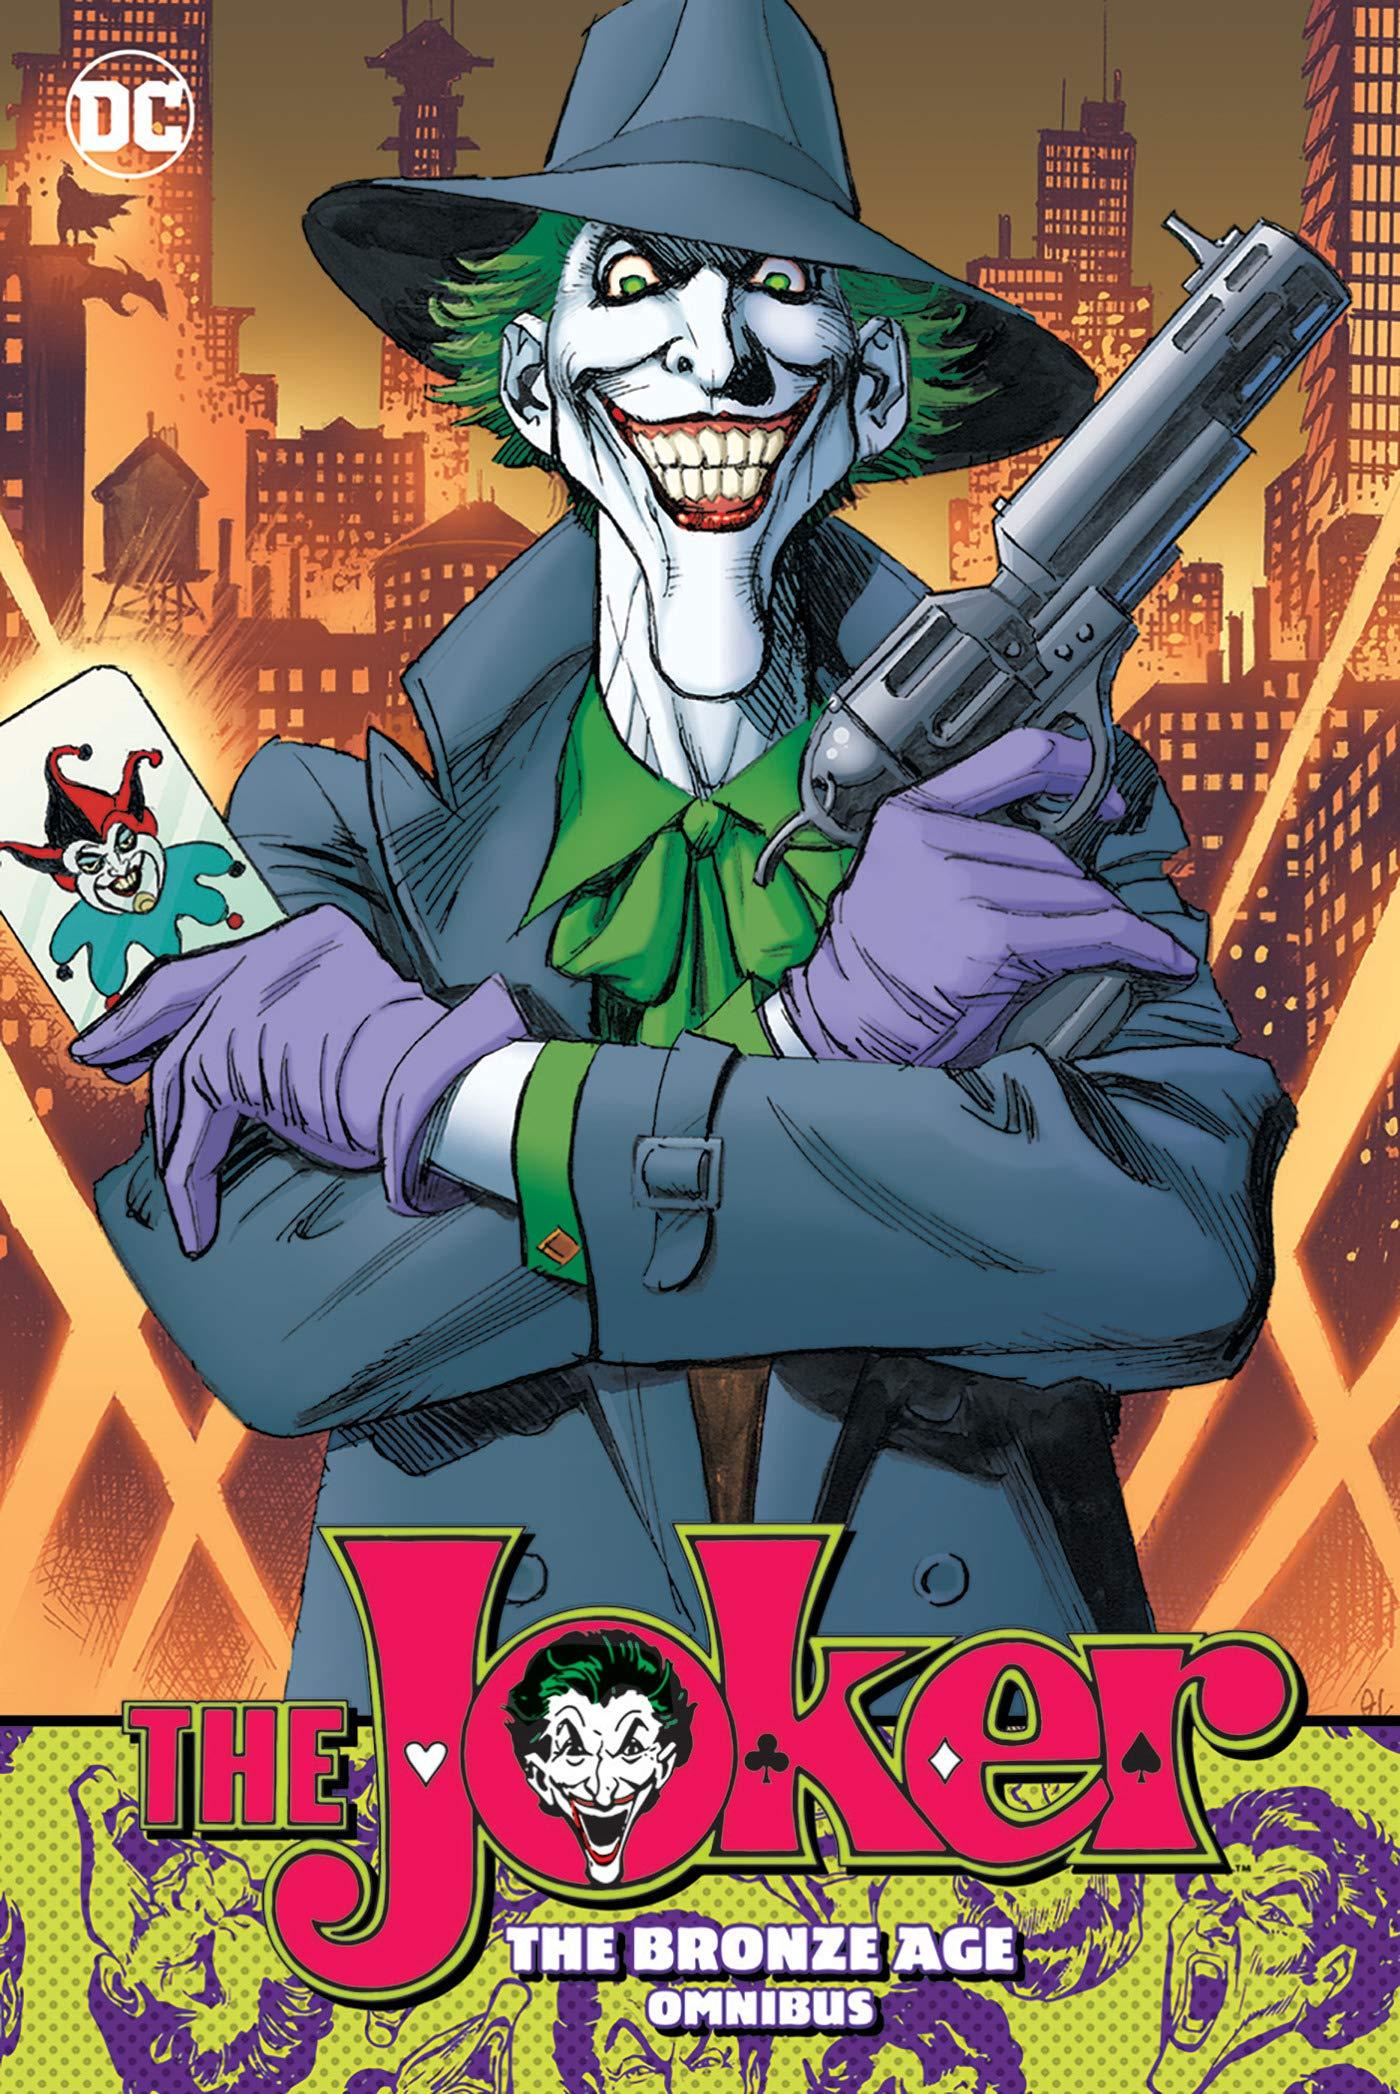 The Joker: The Bronze Age Omnibus by DC Comics